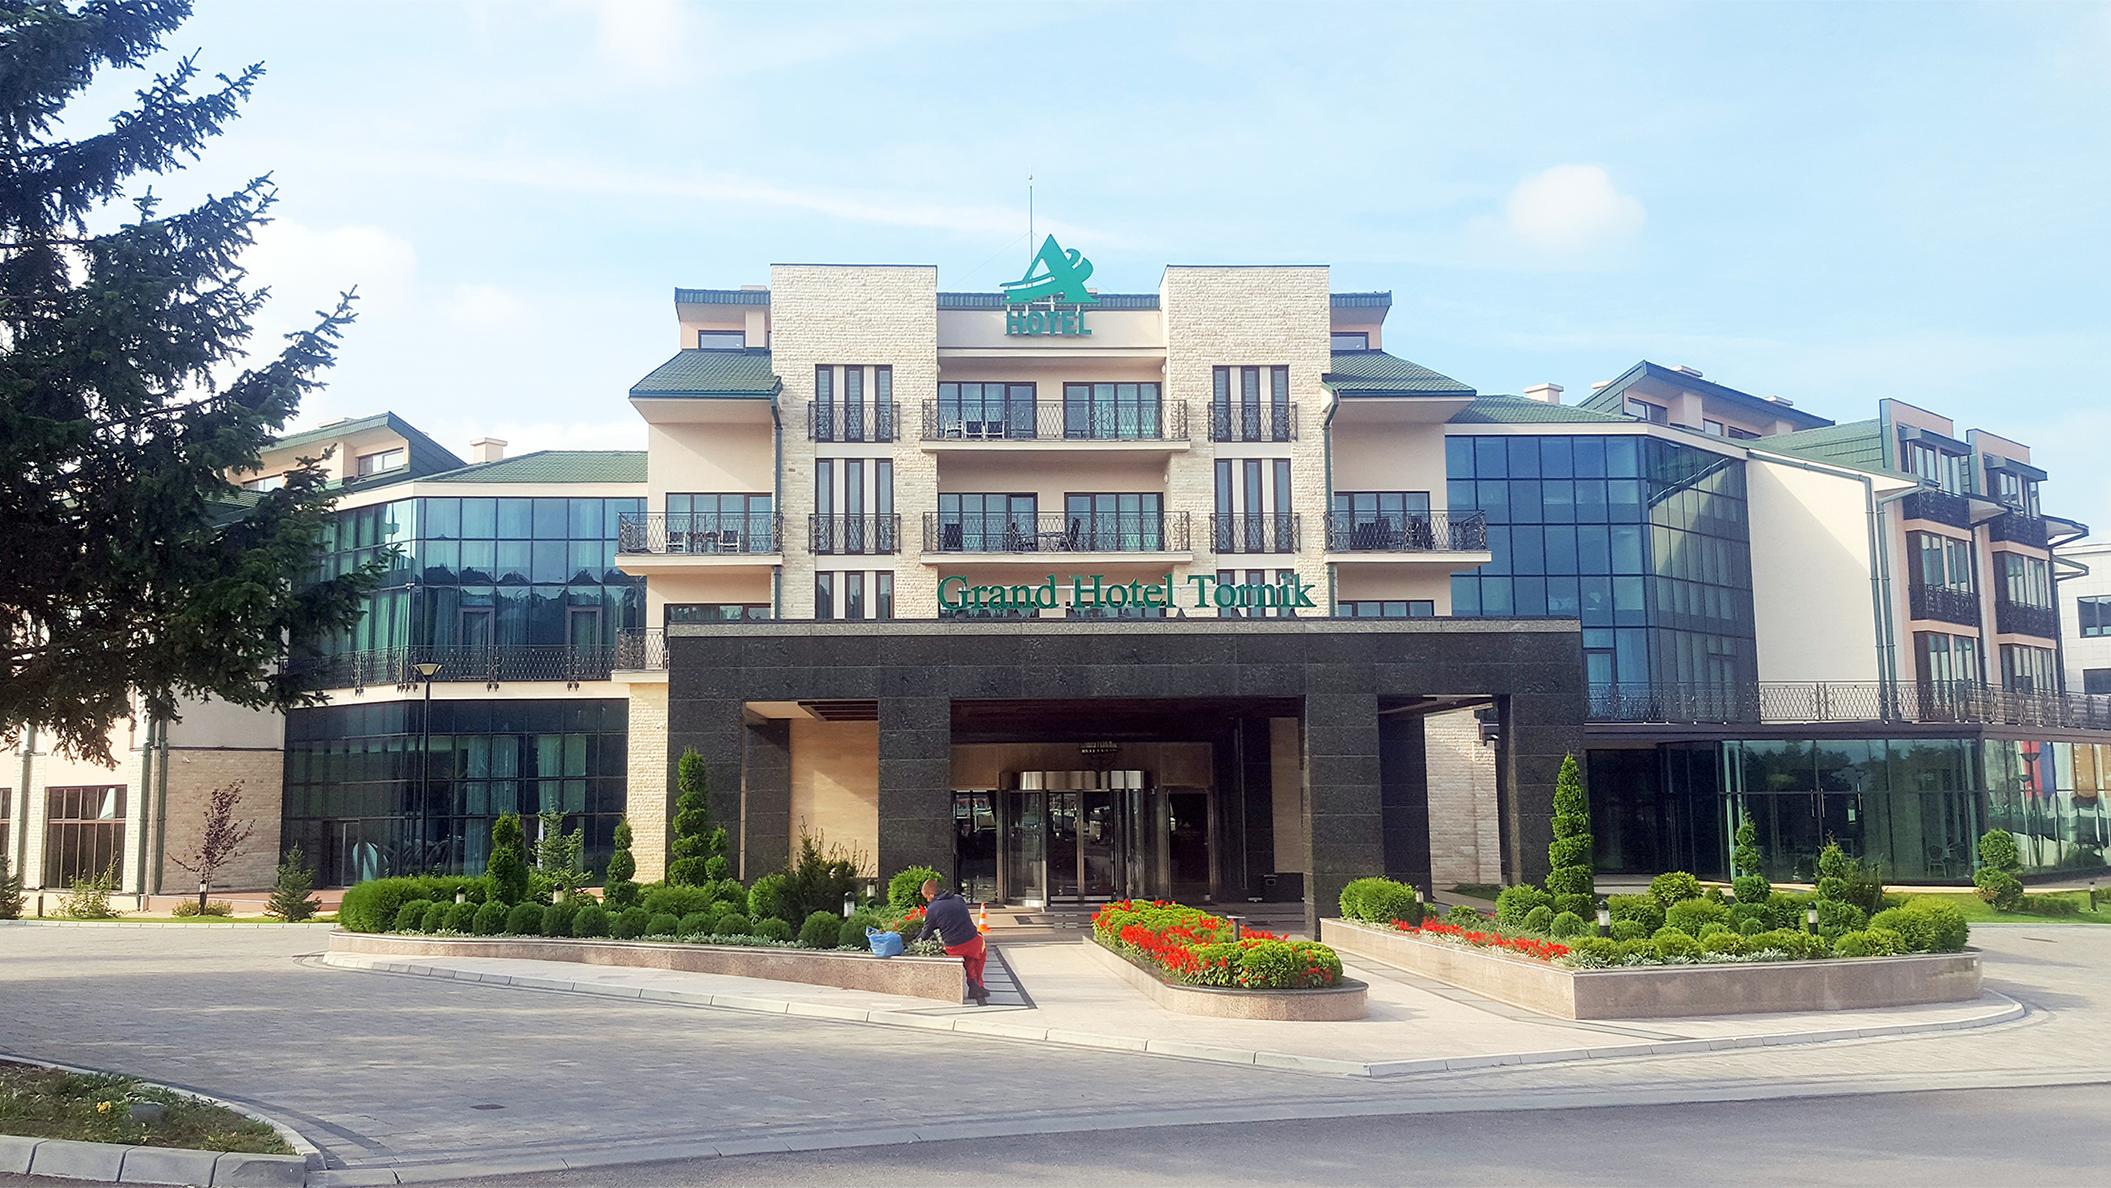 Grand hotel Tornik Zlatibor, ISTN